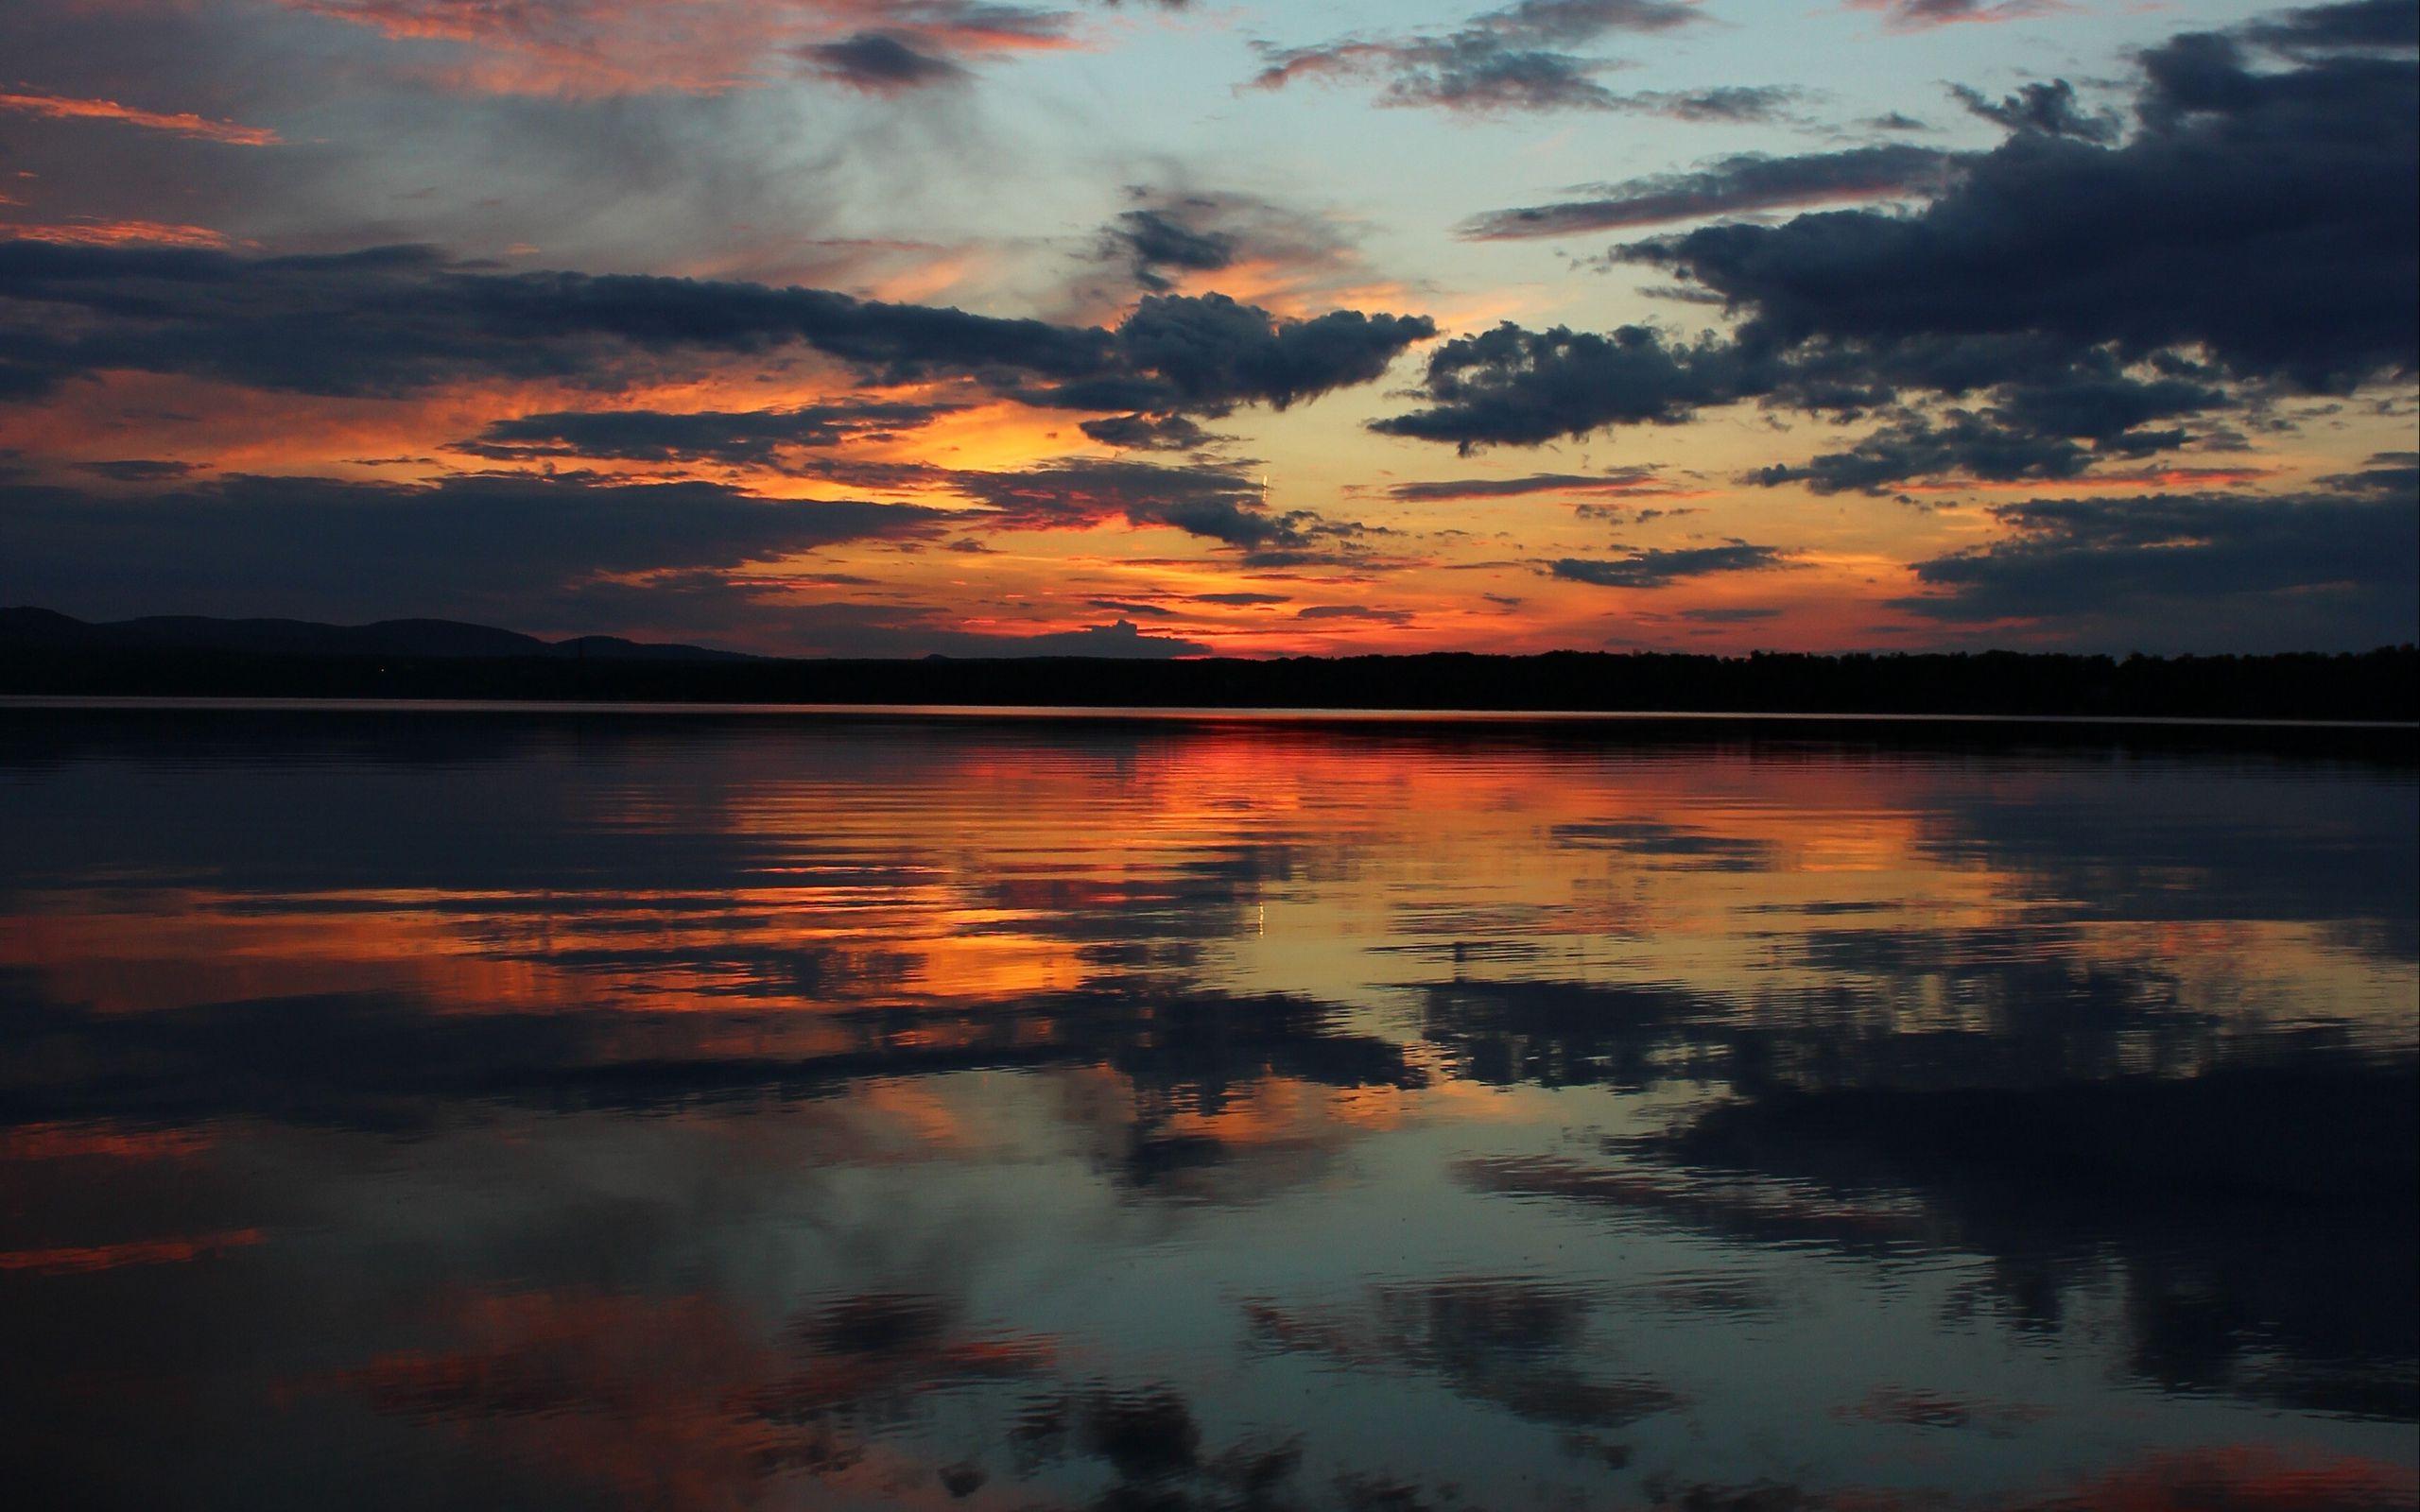 Download wallpaper 2560x1600 horizon sunset sky river 2560x1600